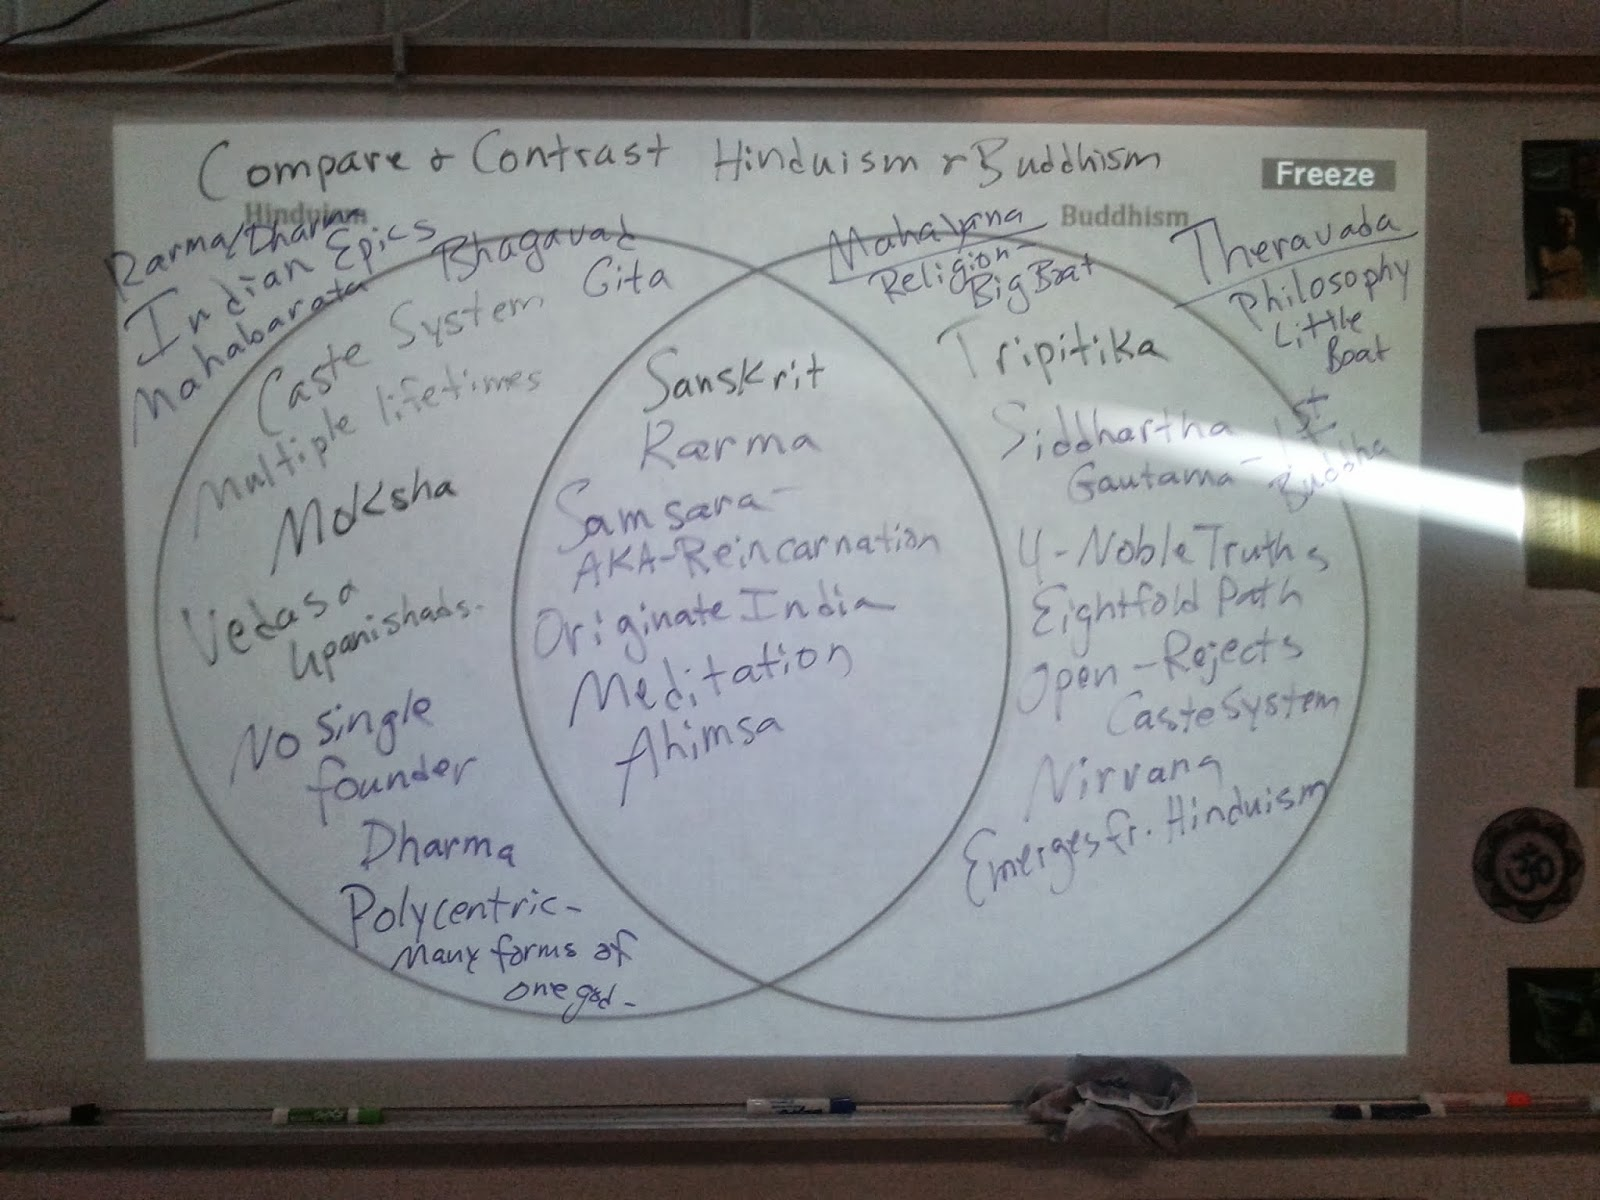 hinduism buddhism venn diagram 2004 dodge ram fuse box essay comparison christianity birthdayessay x